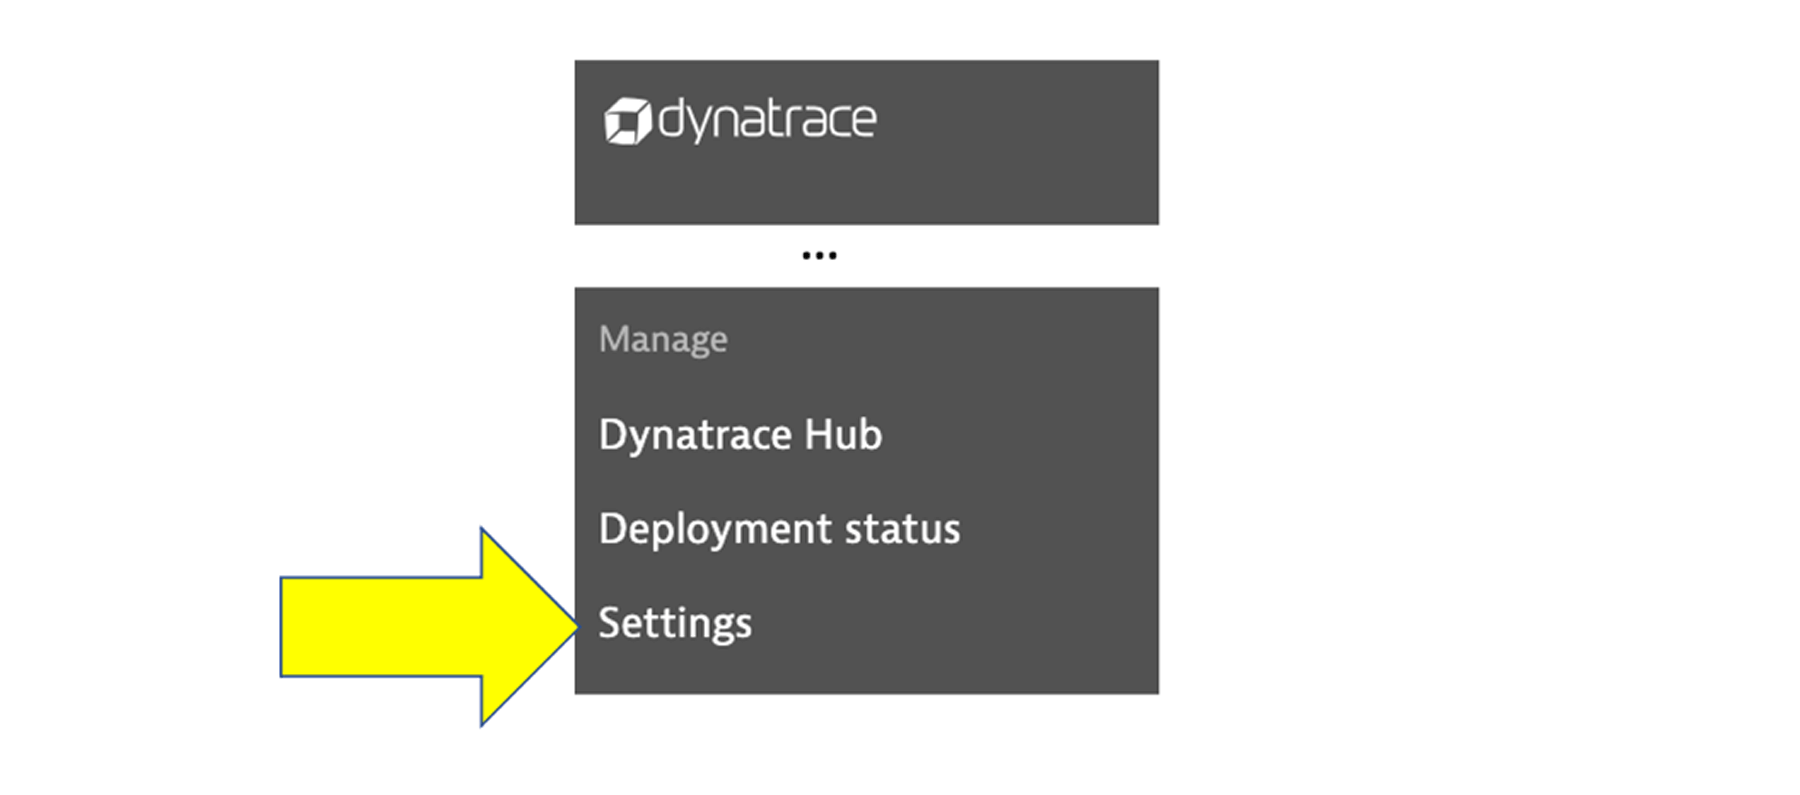 Settings option under Deployment status